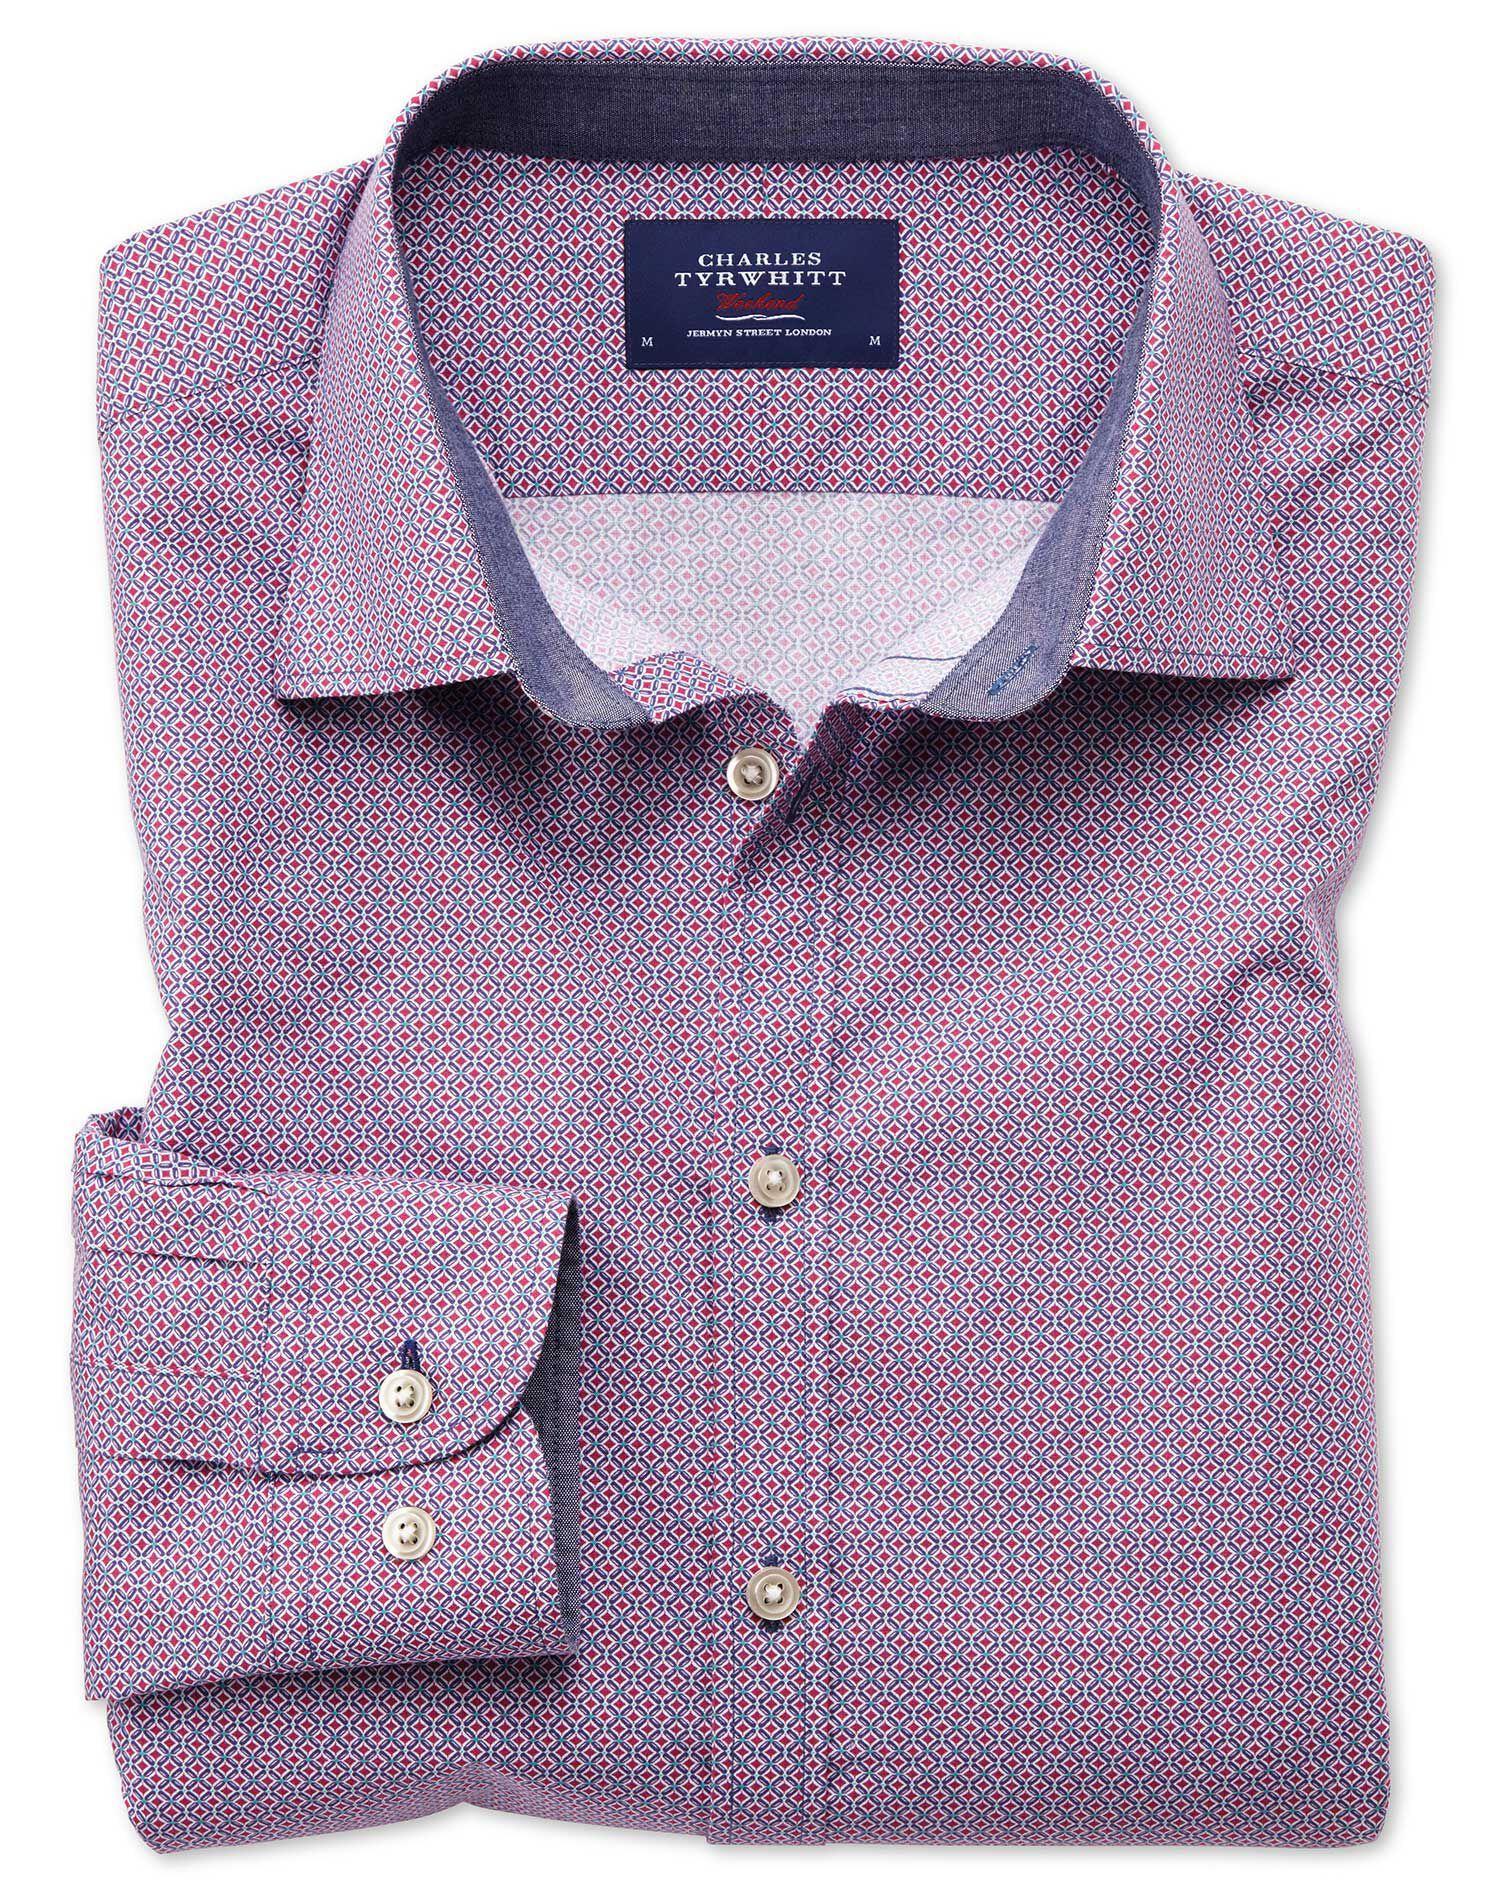 Extra Slim Fit Magenta and Blue Print Cotton Shirt Single Cuff Size XXL by Charles Tyrwhitt